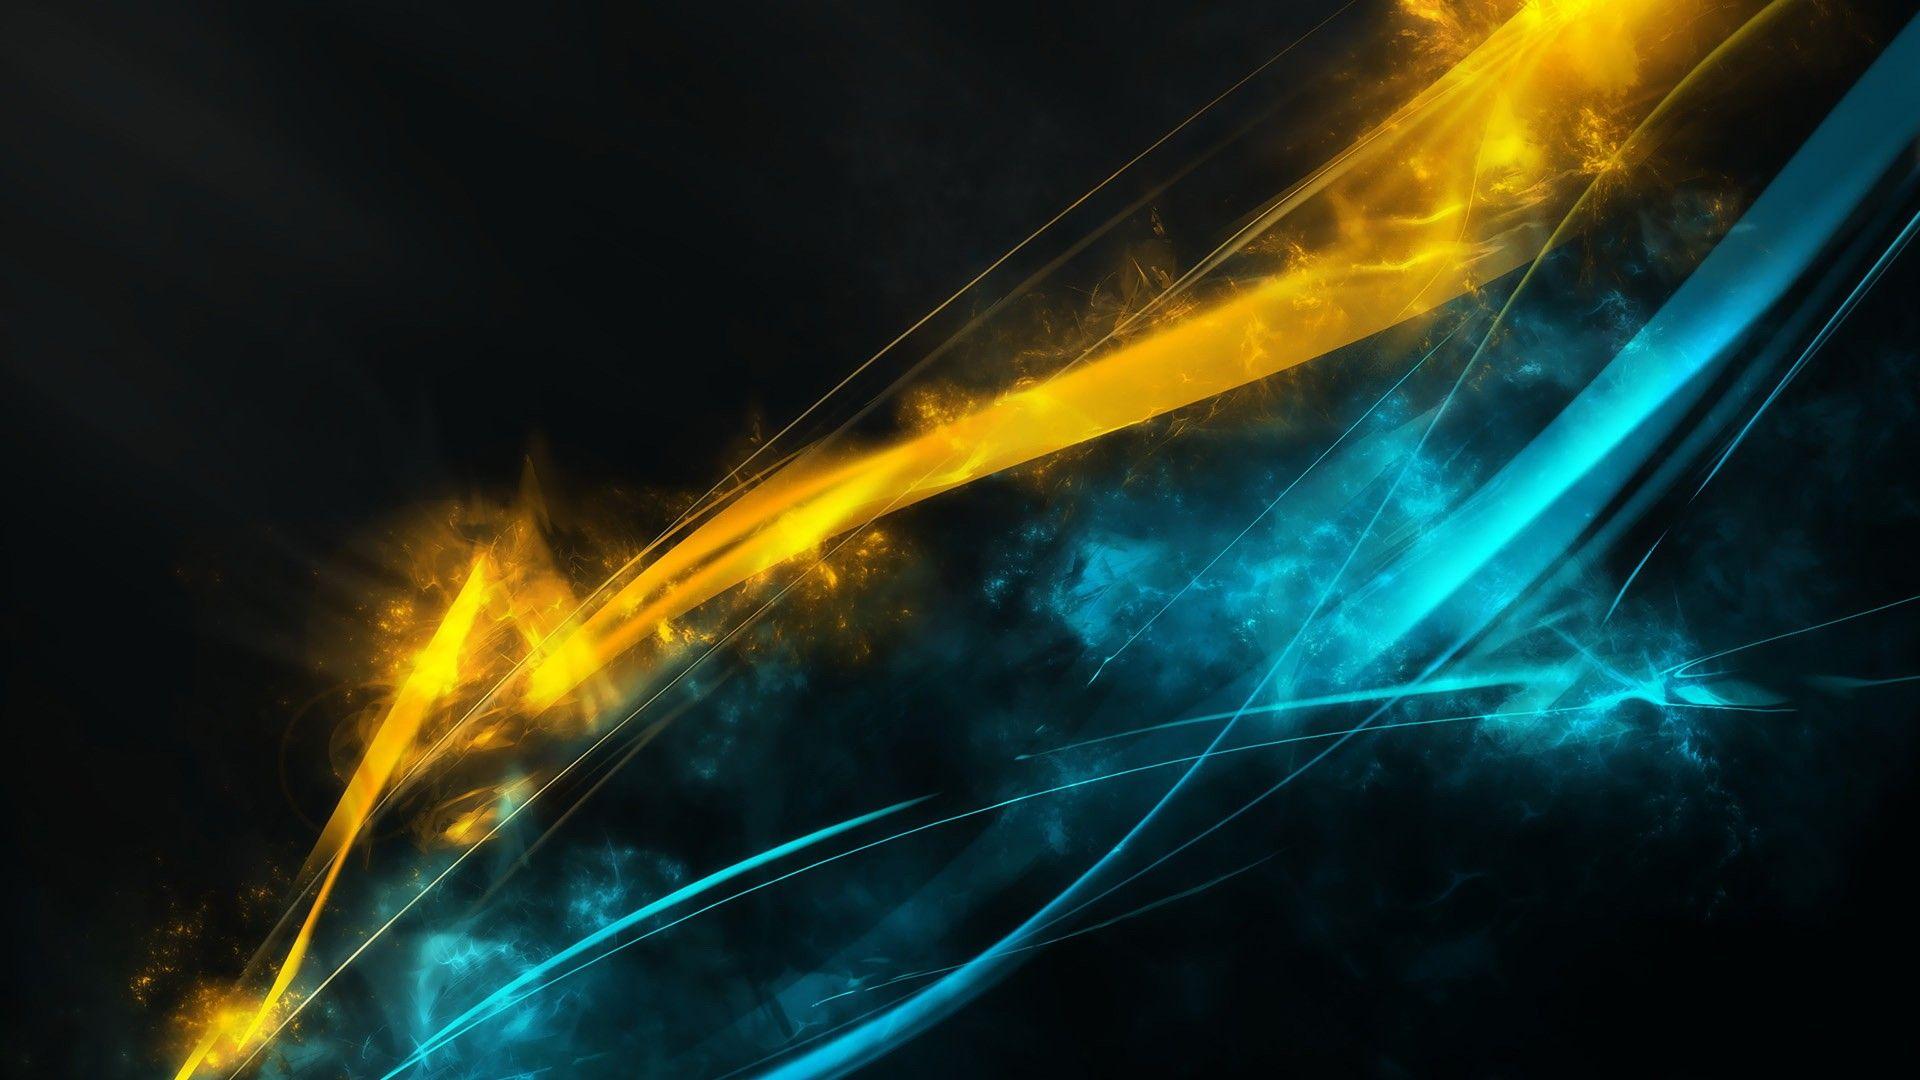 Abstract Desktop Wallpaper Design